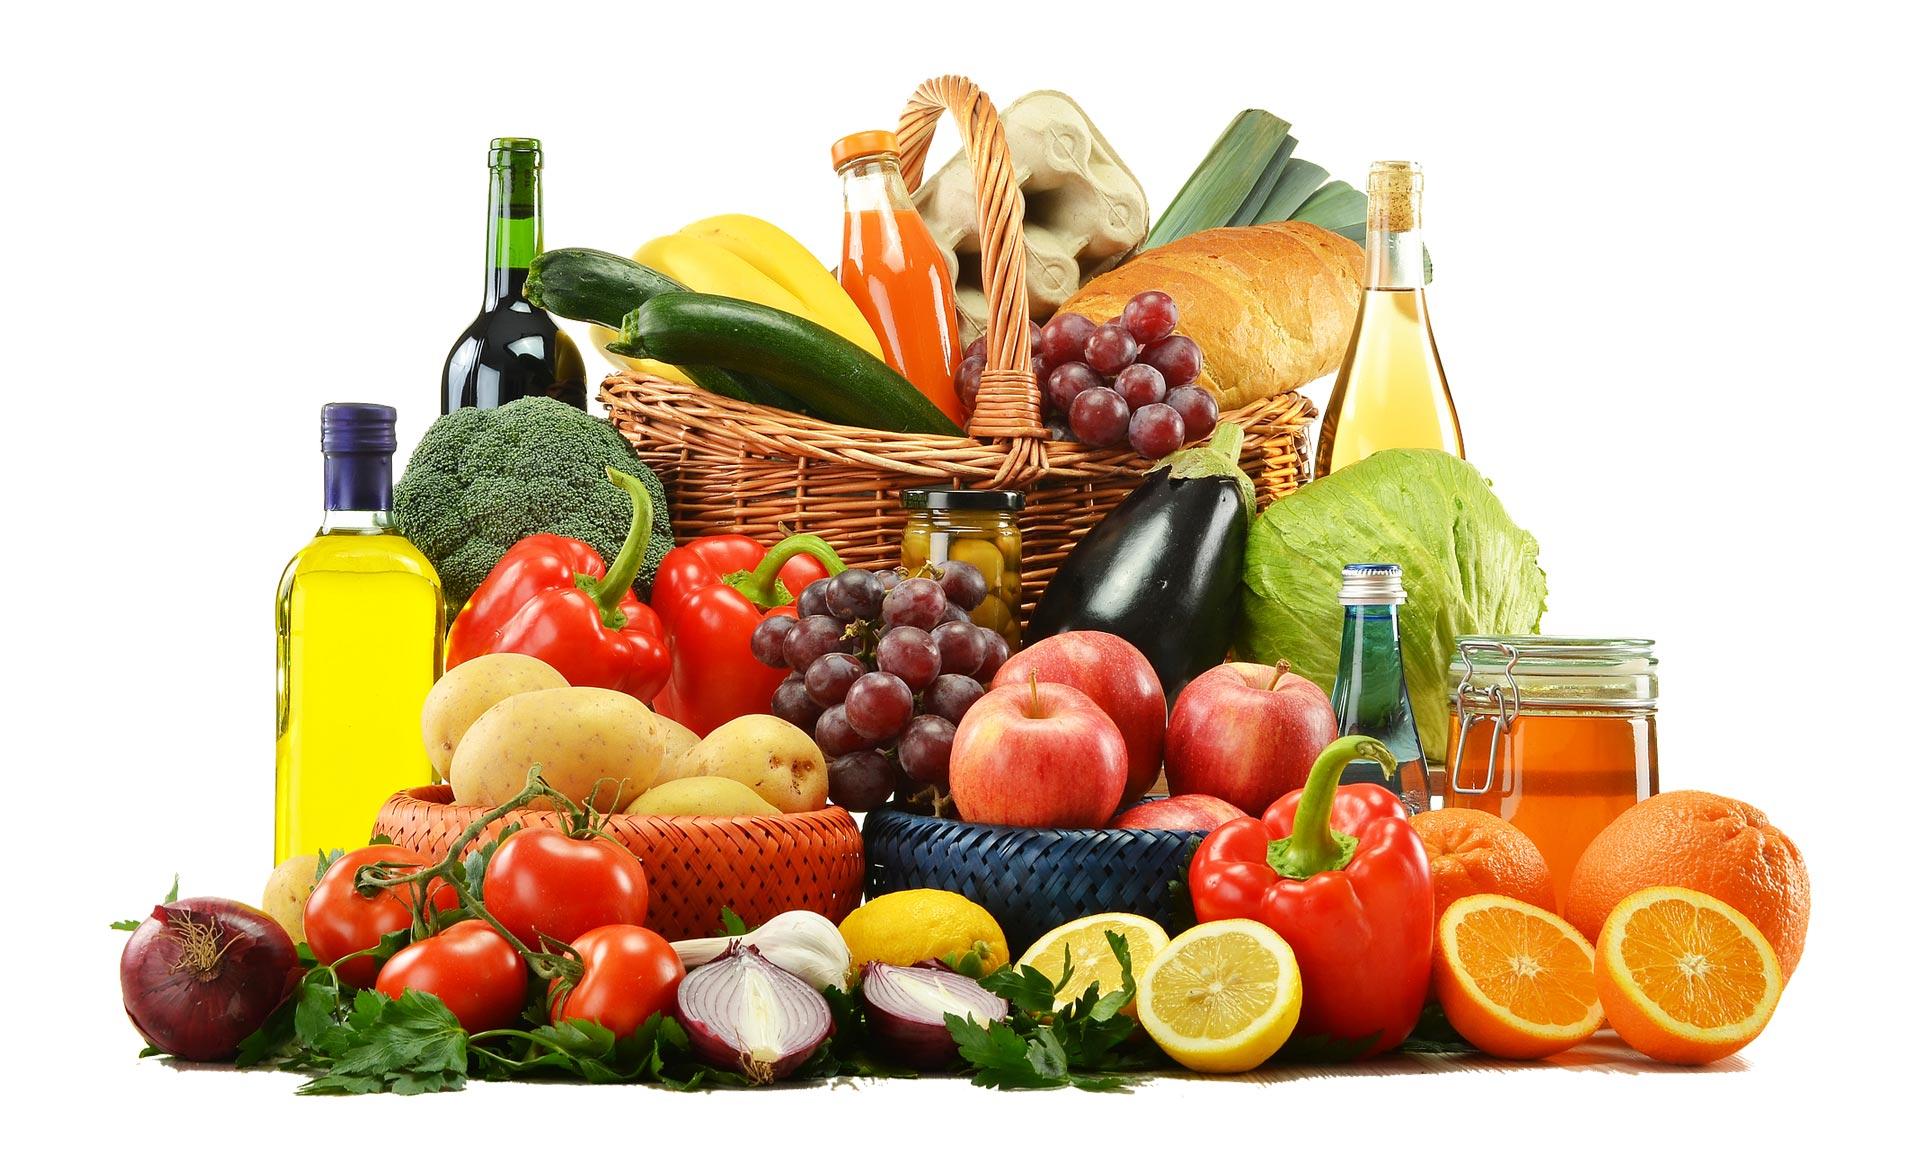 A healthy kitchen